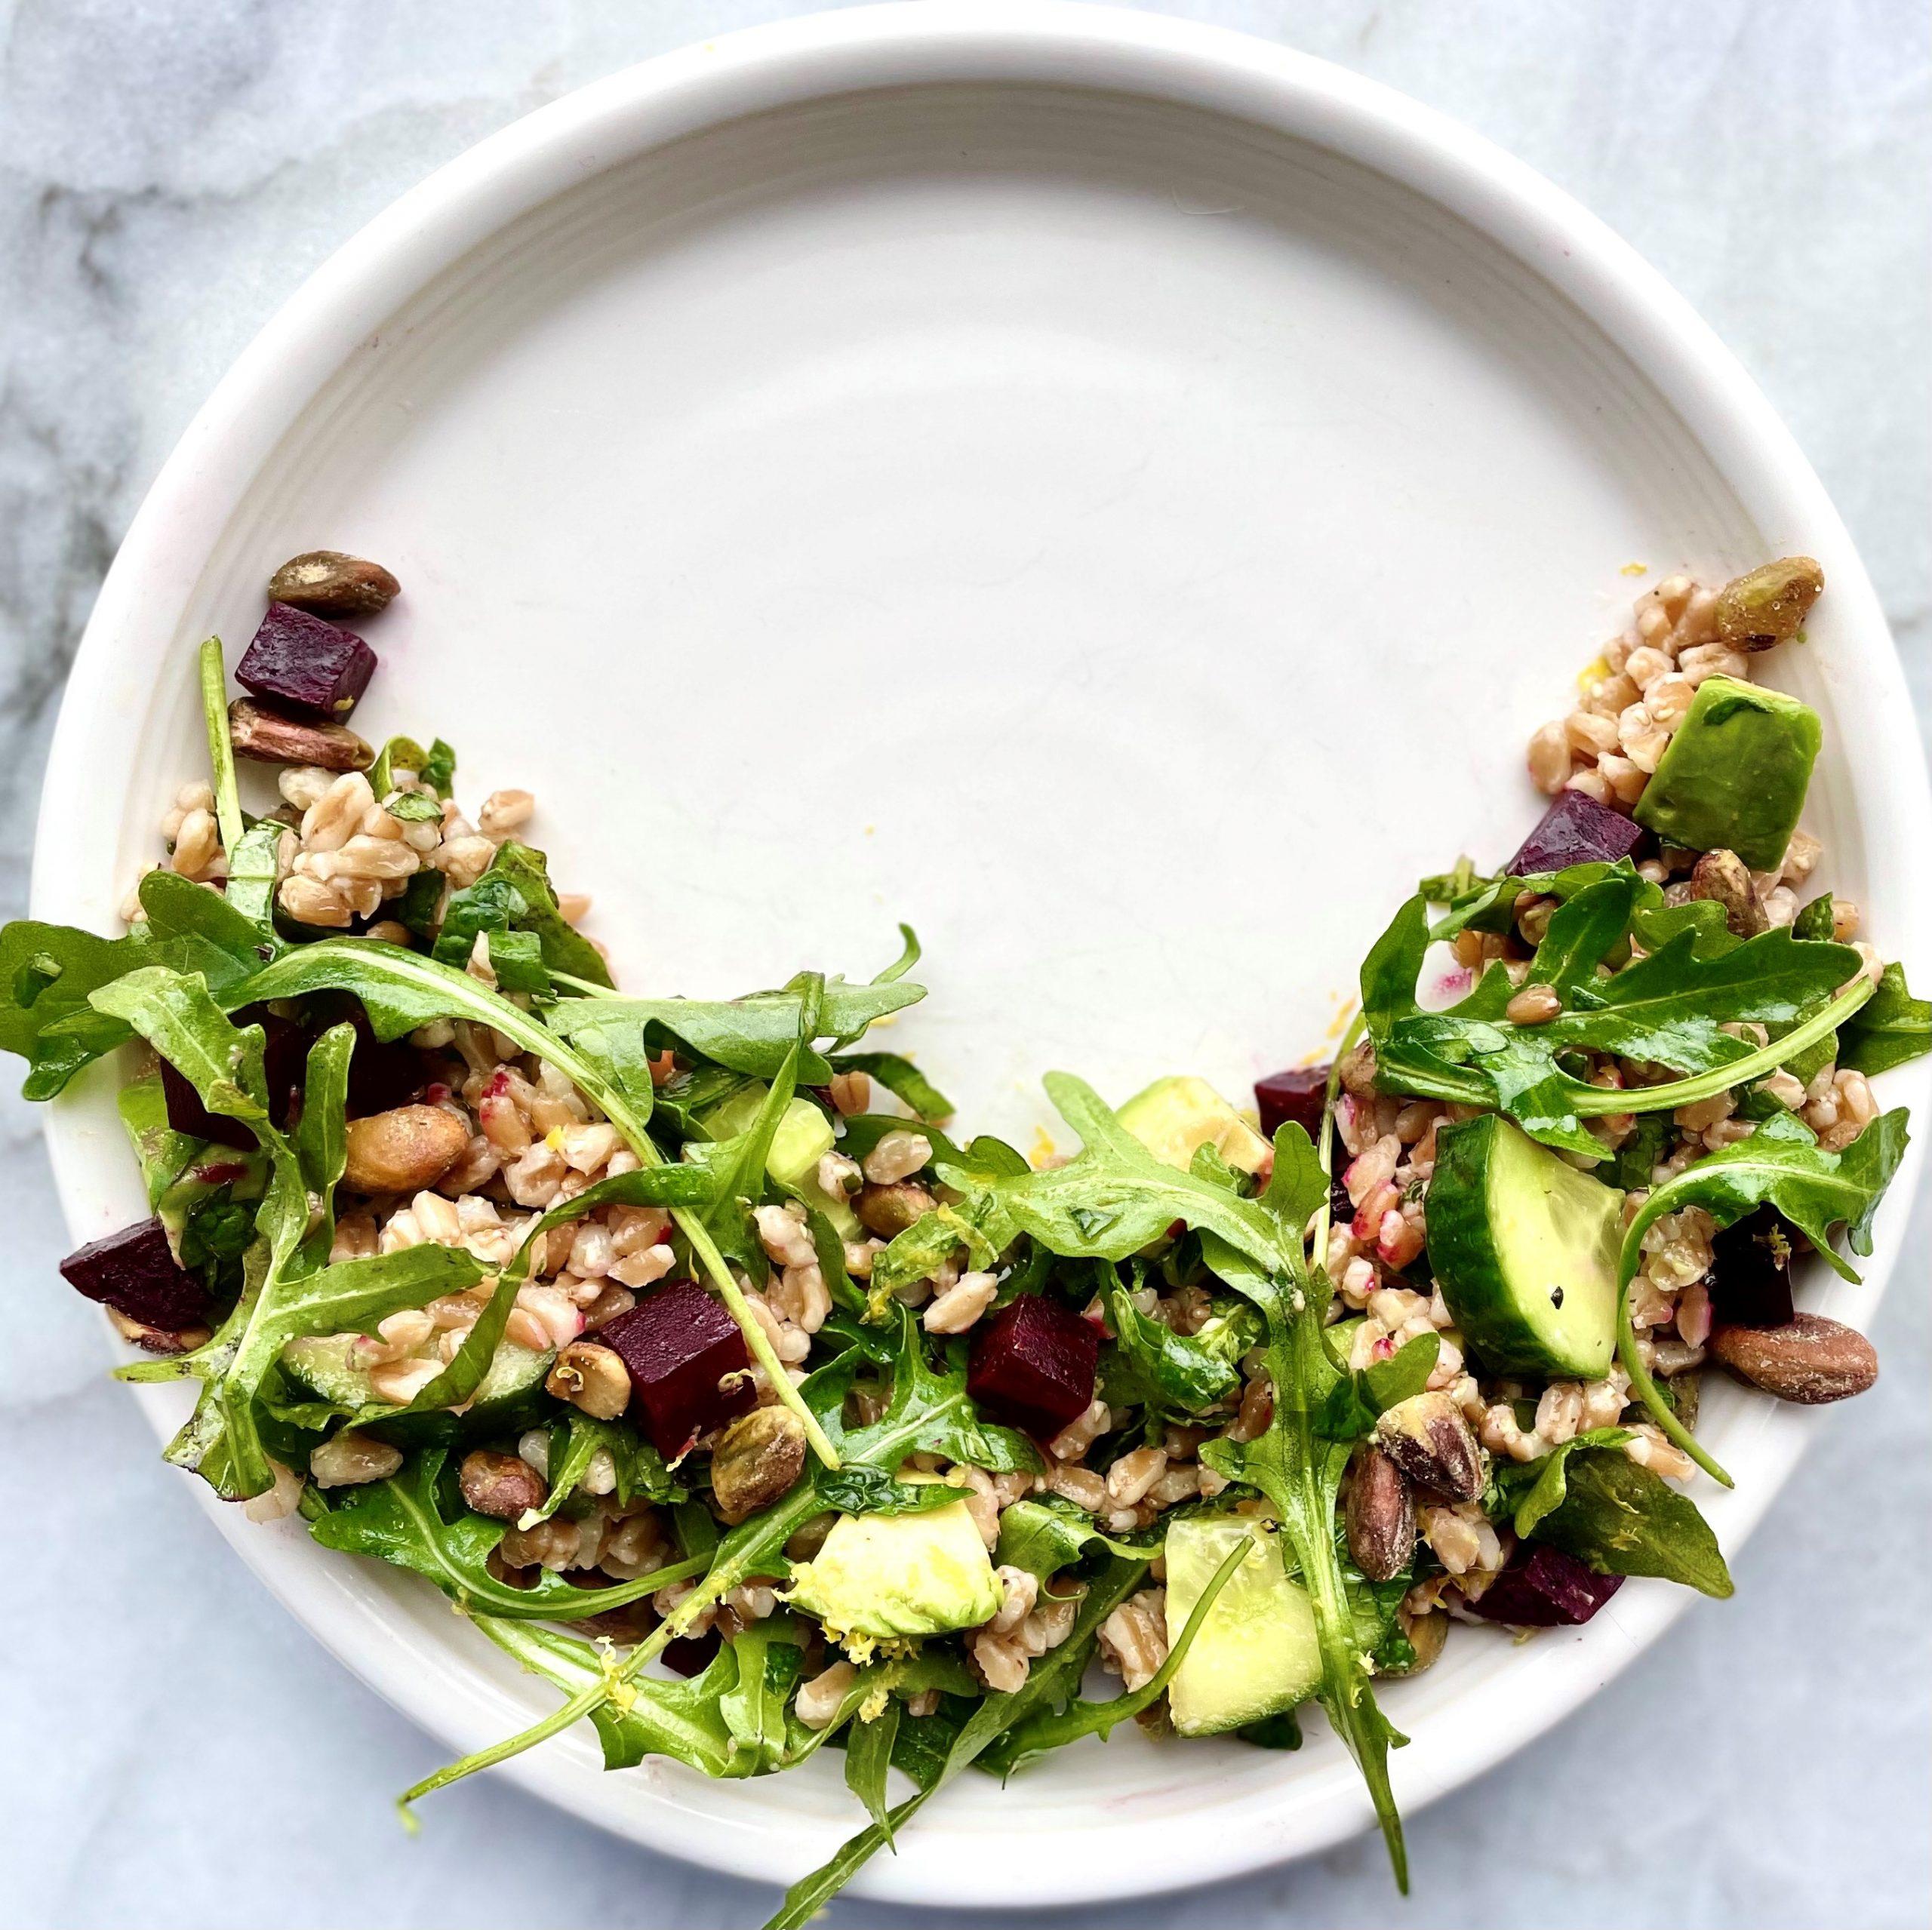 jasmine green tea grain & herb salad